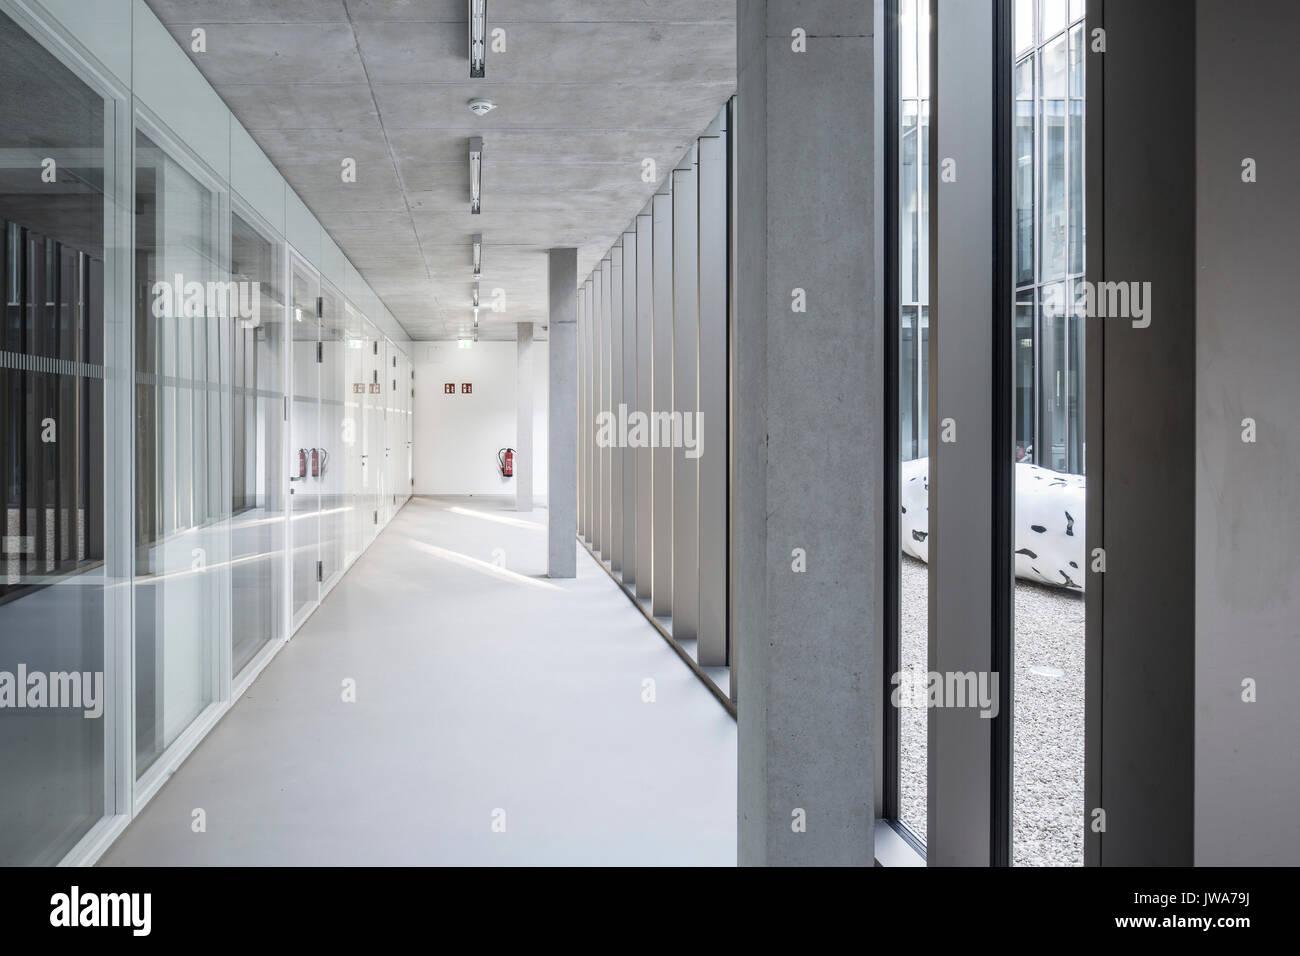 Architekten Biberach corridor with window wall towards courtyard finanzamt finance